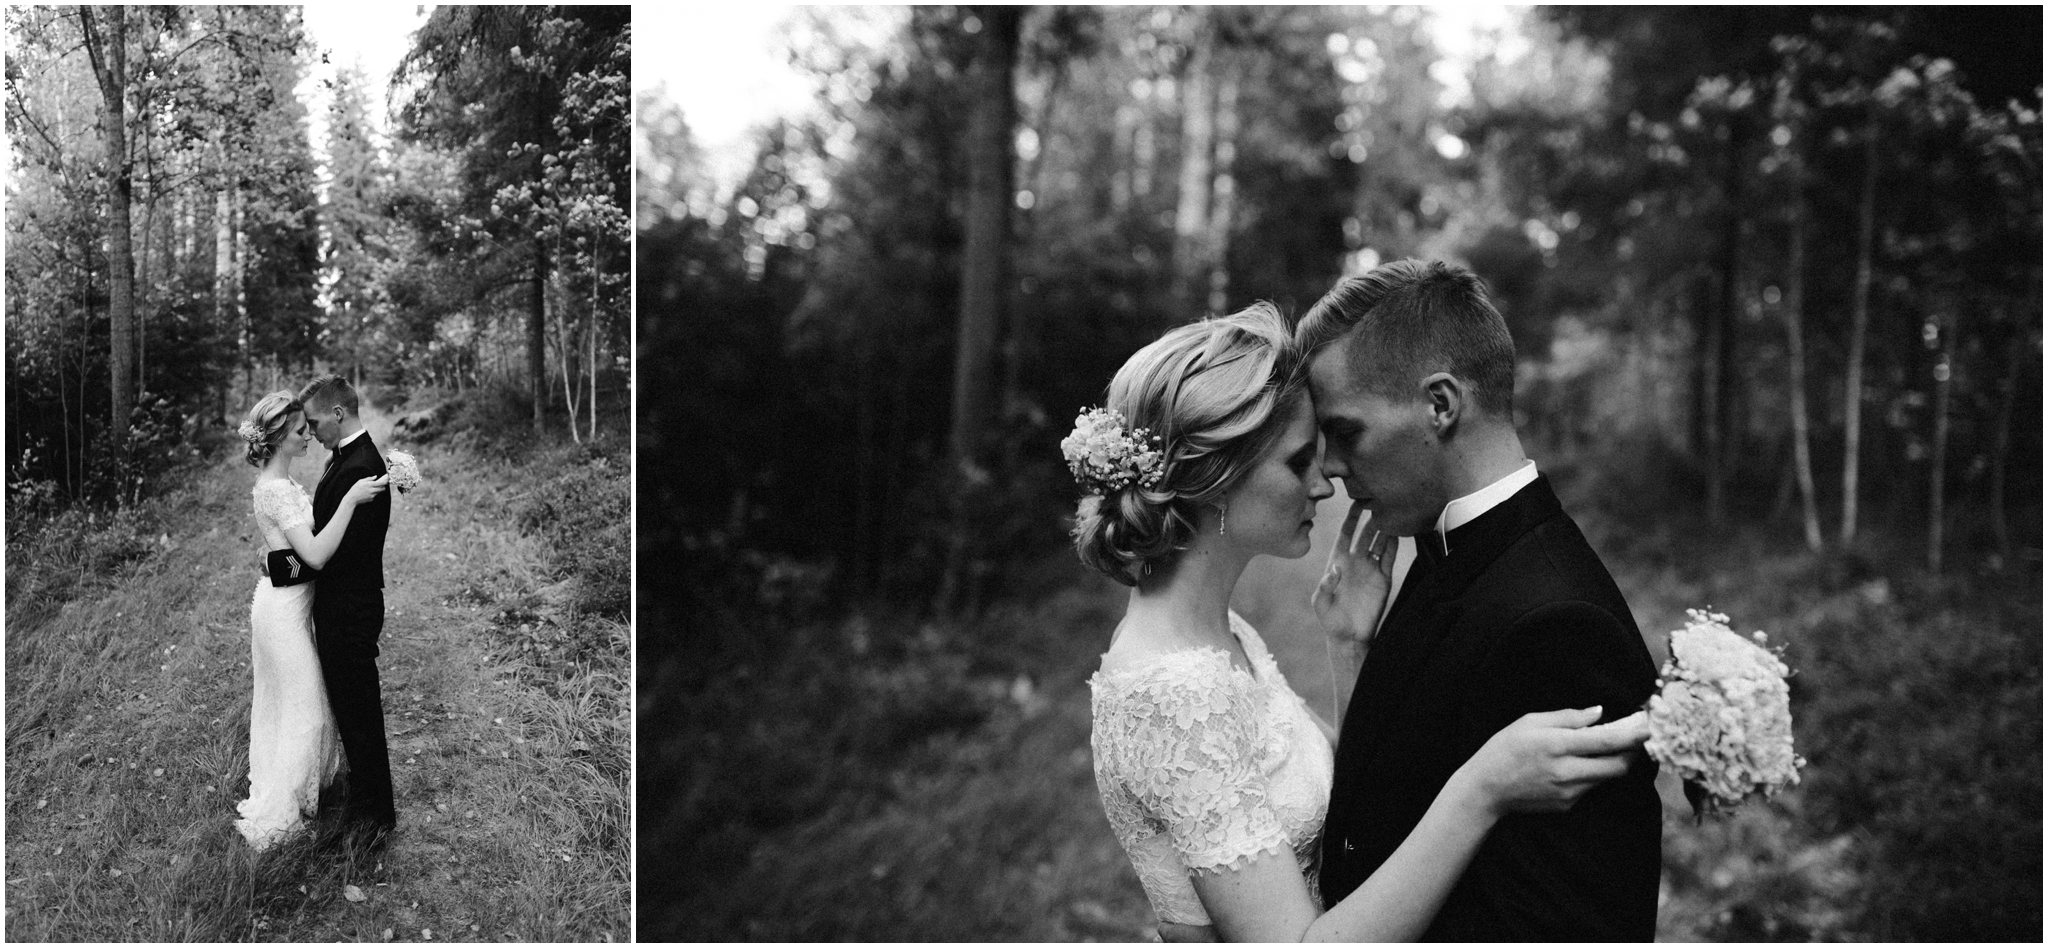 Pinja + Marko -- Patrick Karkkolainen Wedding Photographer-93.jpg